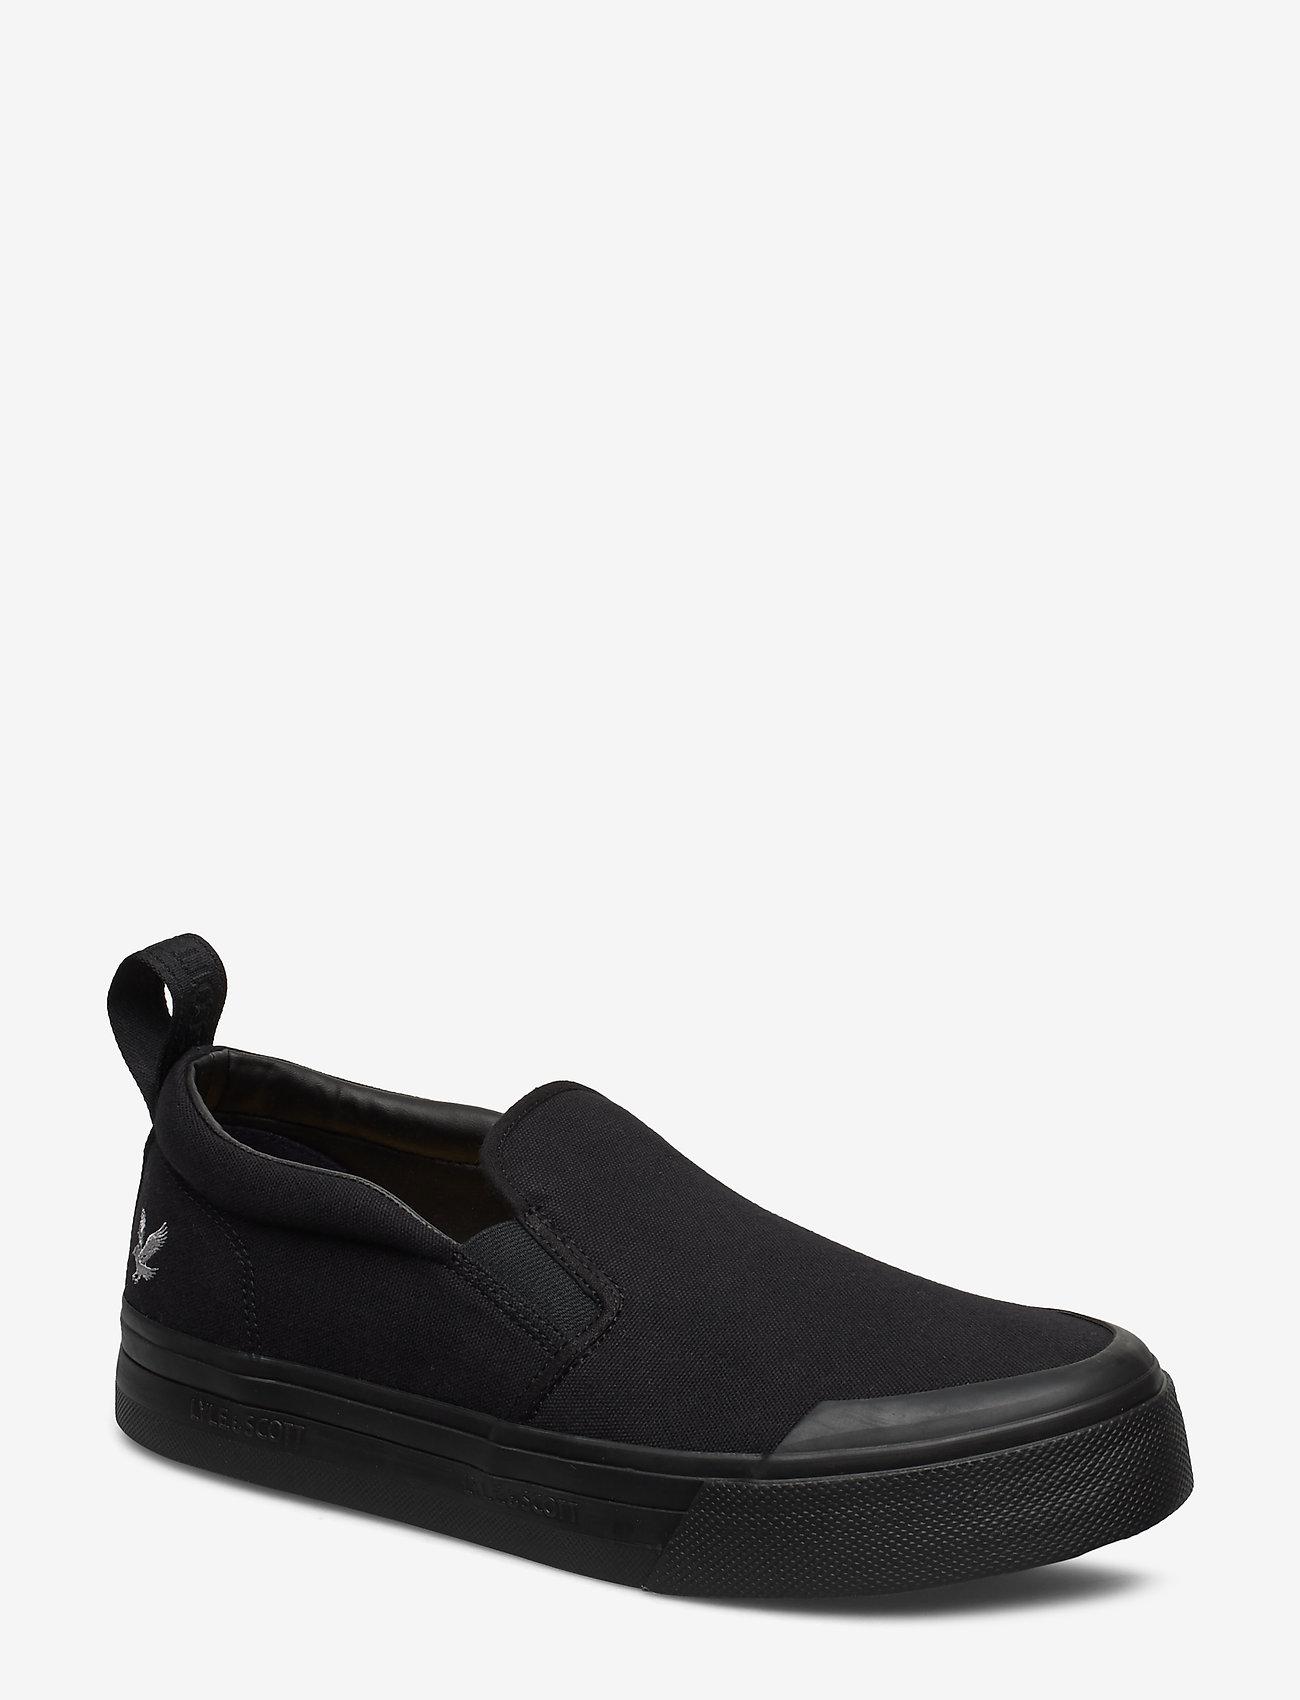 Lyle & Scott - Duncan - baskets slip-ons - black/black sole - 0